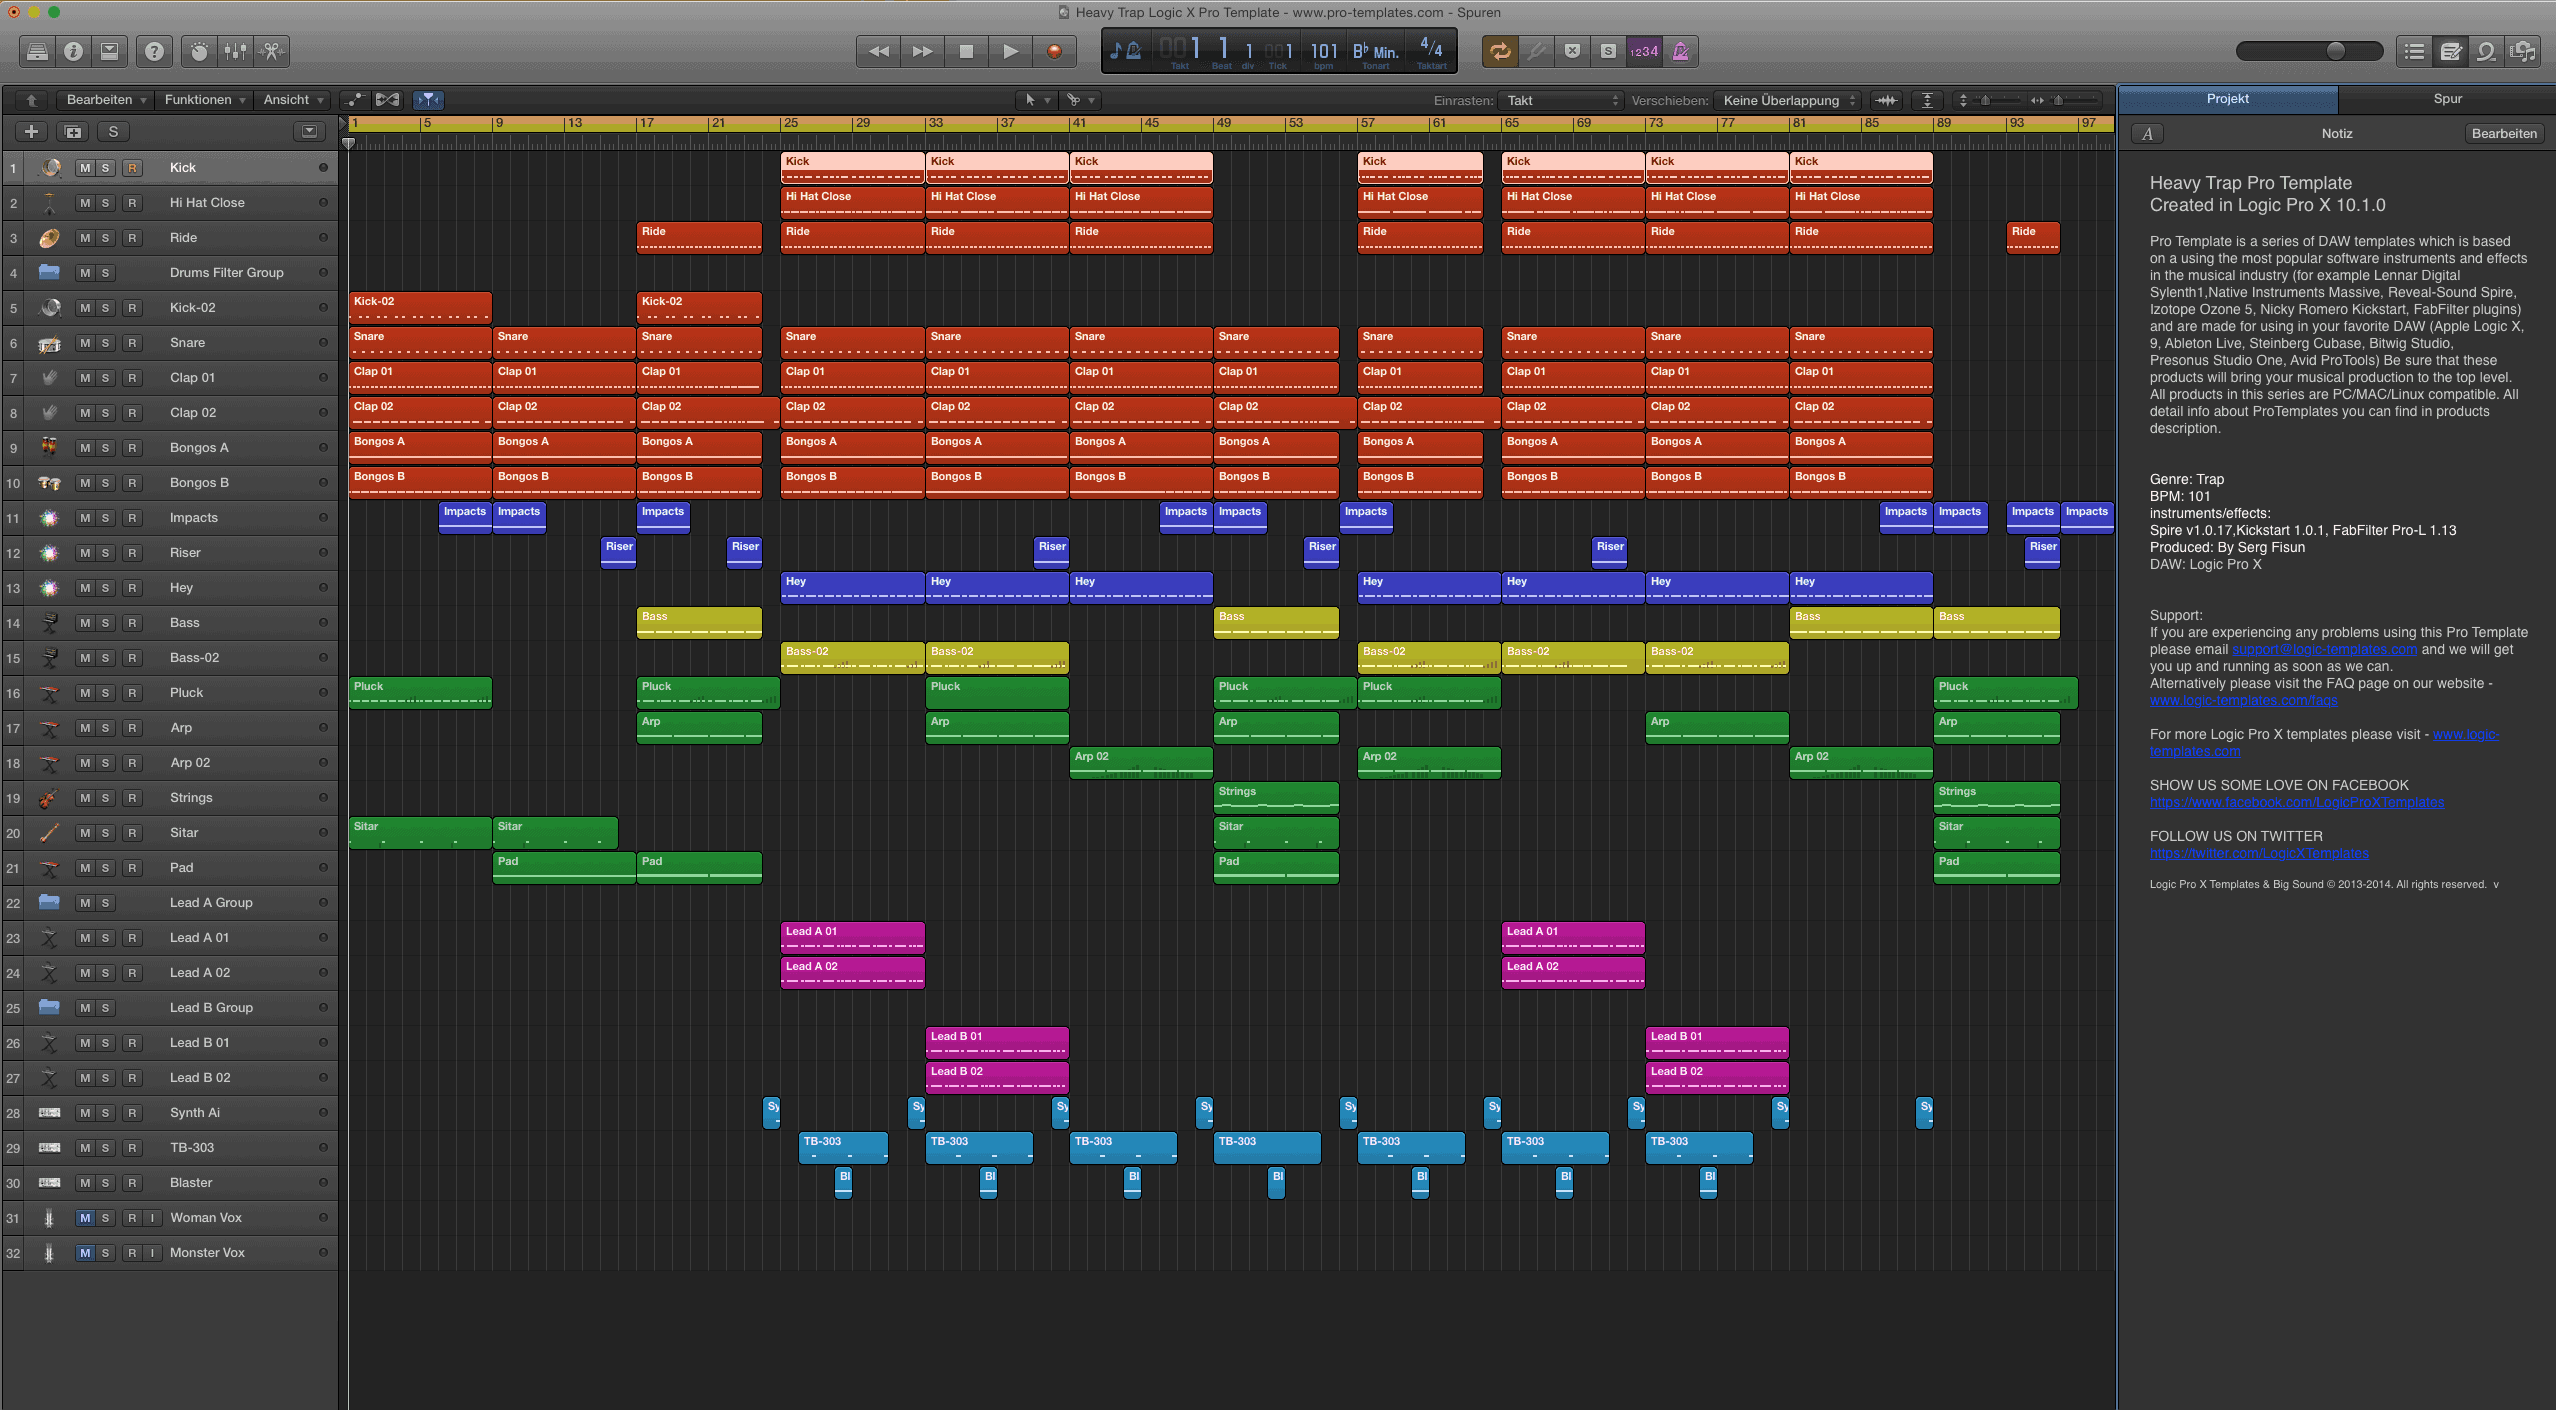 Heavy Trap Logic X Pro Template